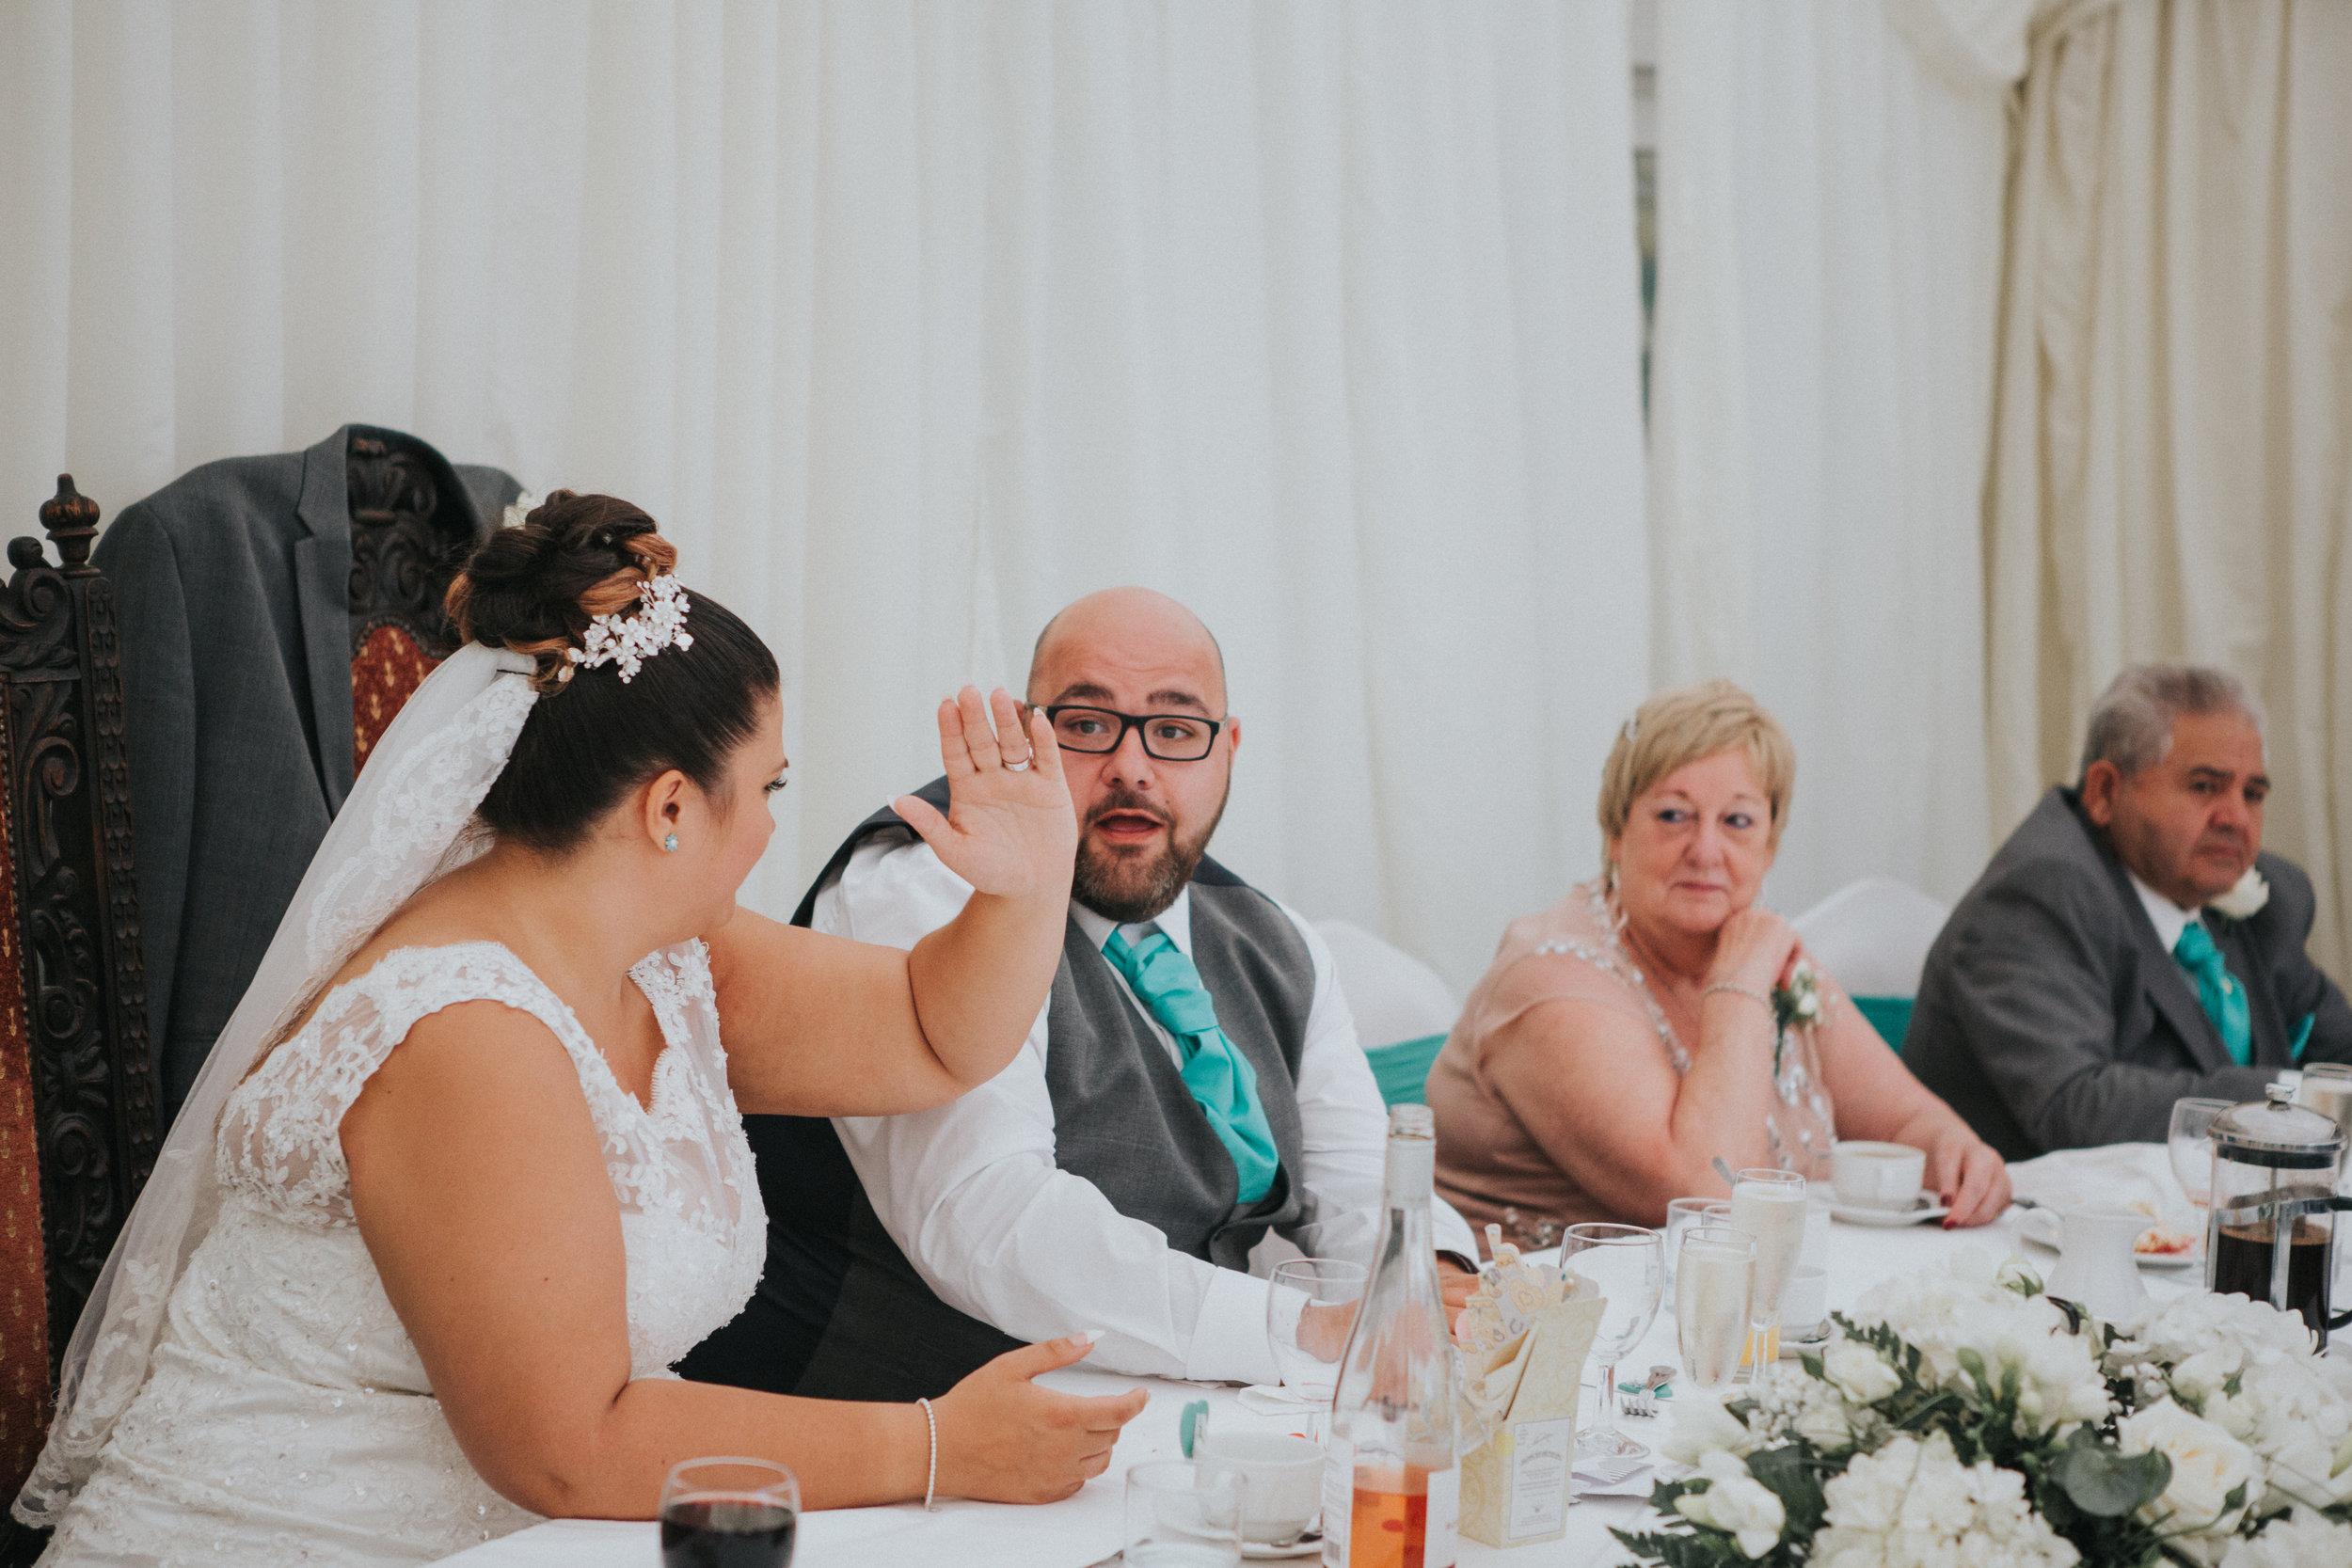 westenhangar-castle-kent-london-wedding-photography-speeches-58